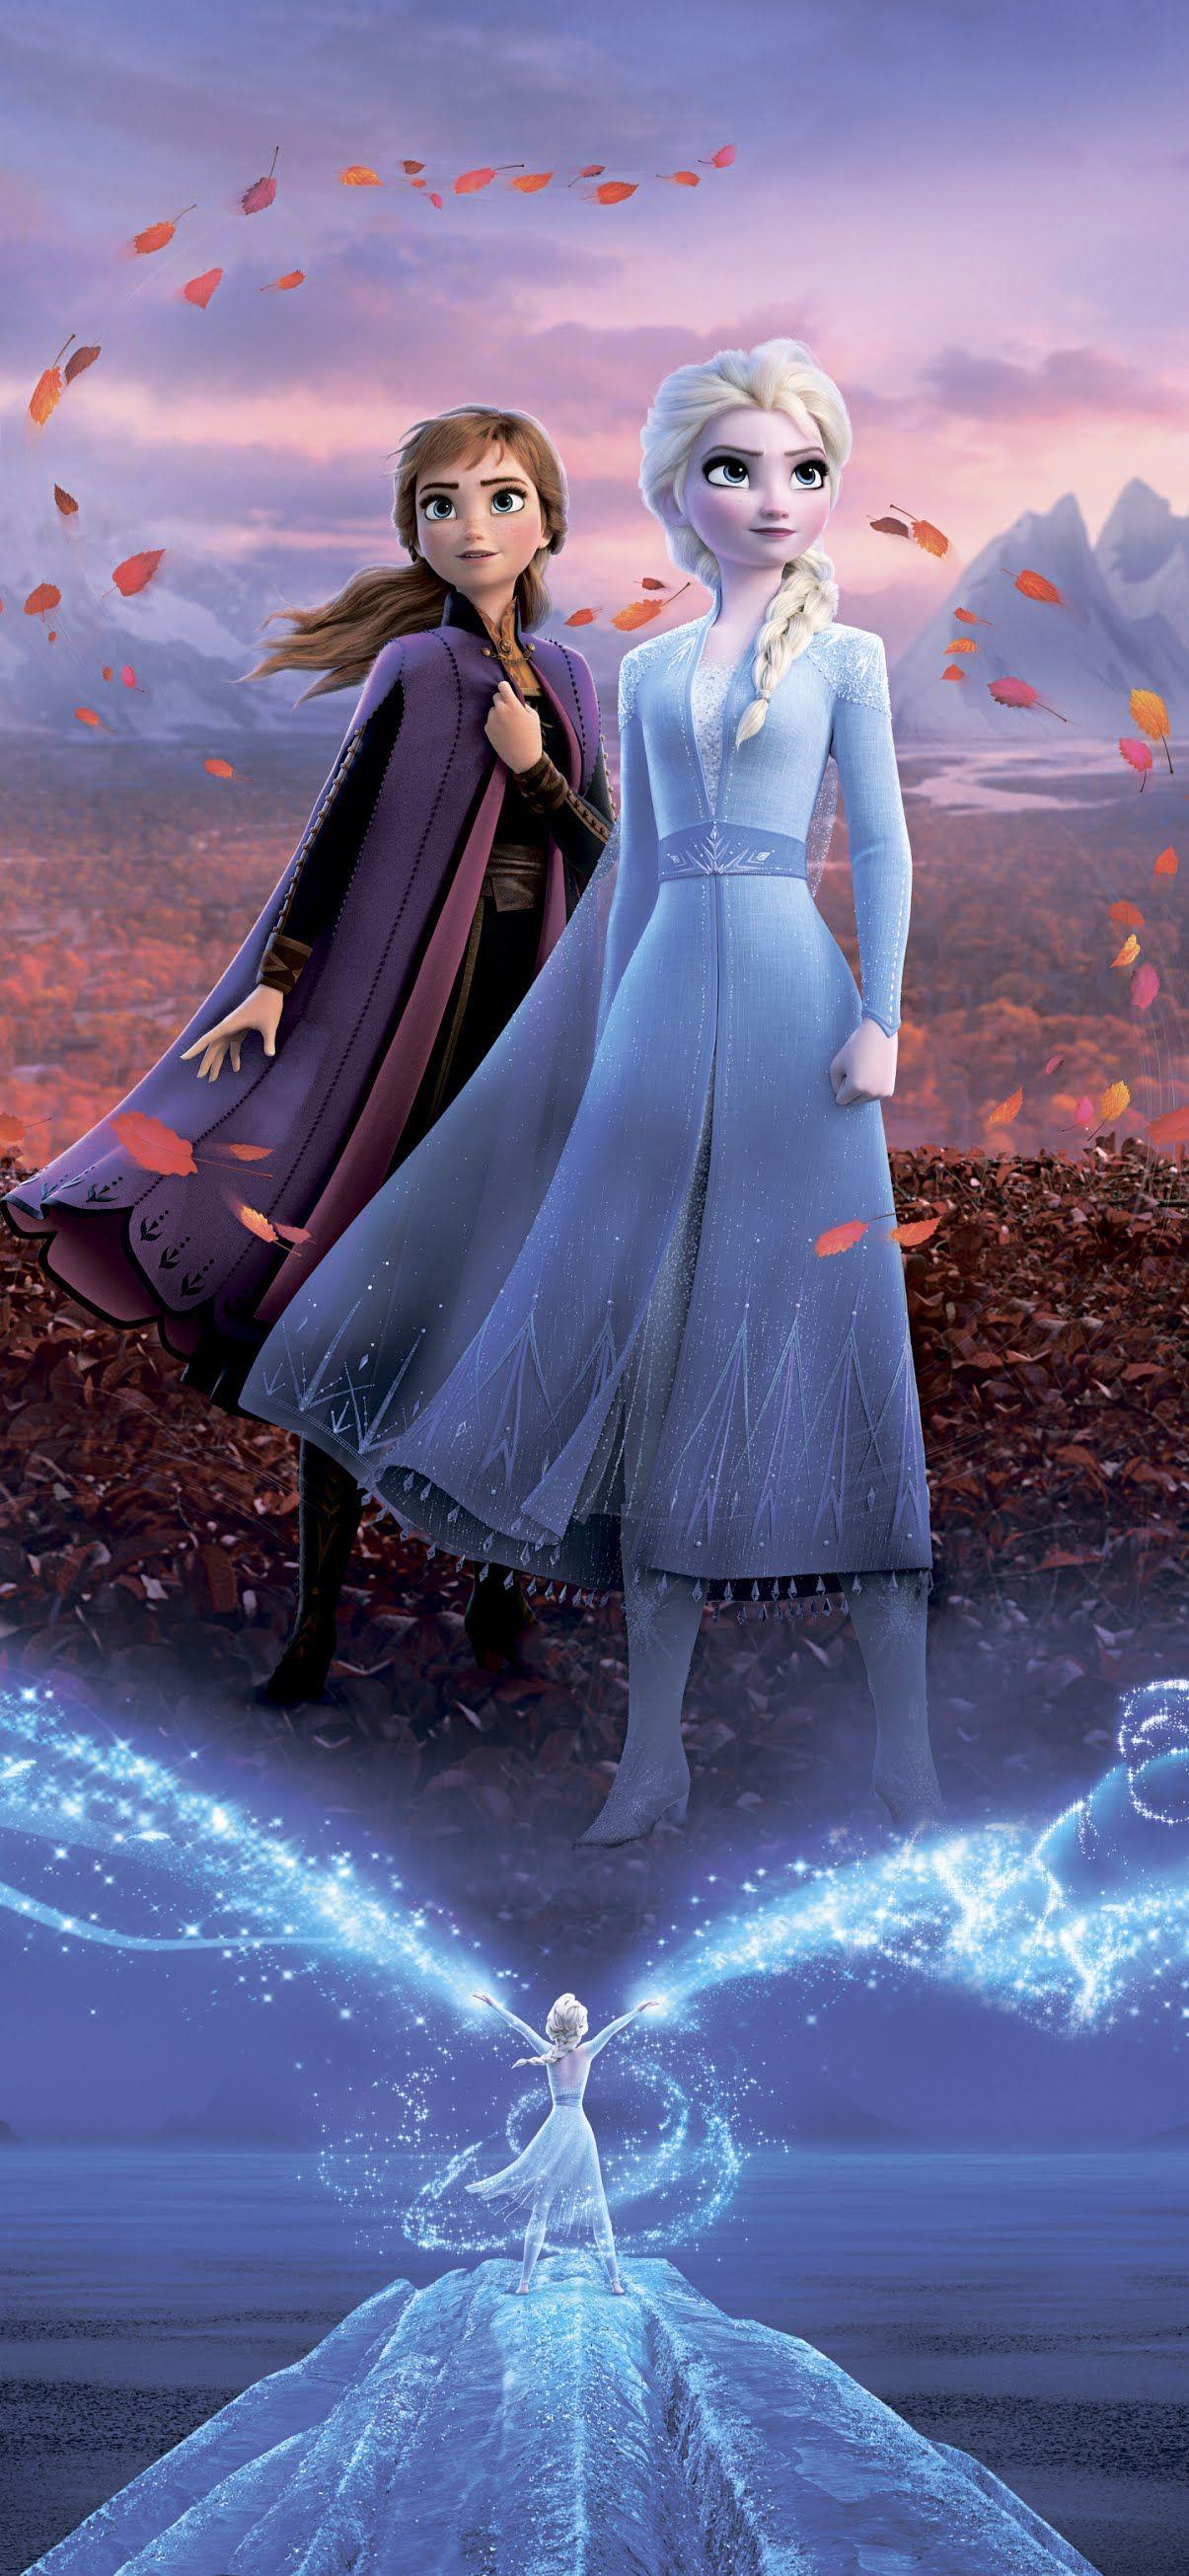 Frozen 2 Mobile Wallpaper Anna Elsa In 2020 Frozen Wallpaper Disney Princess Frozen Disney Princess Wallpaper